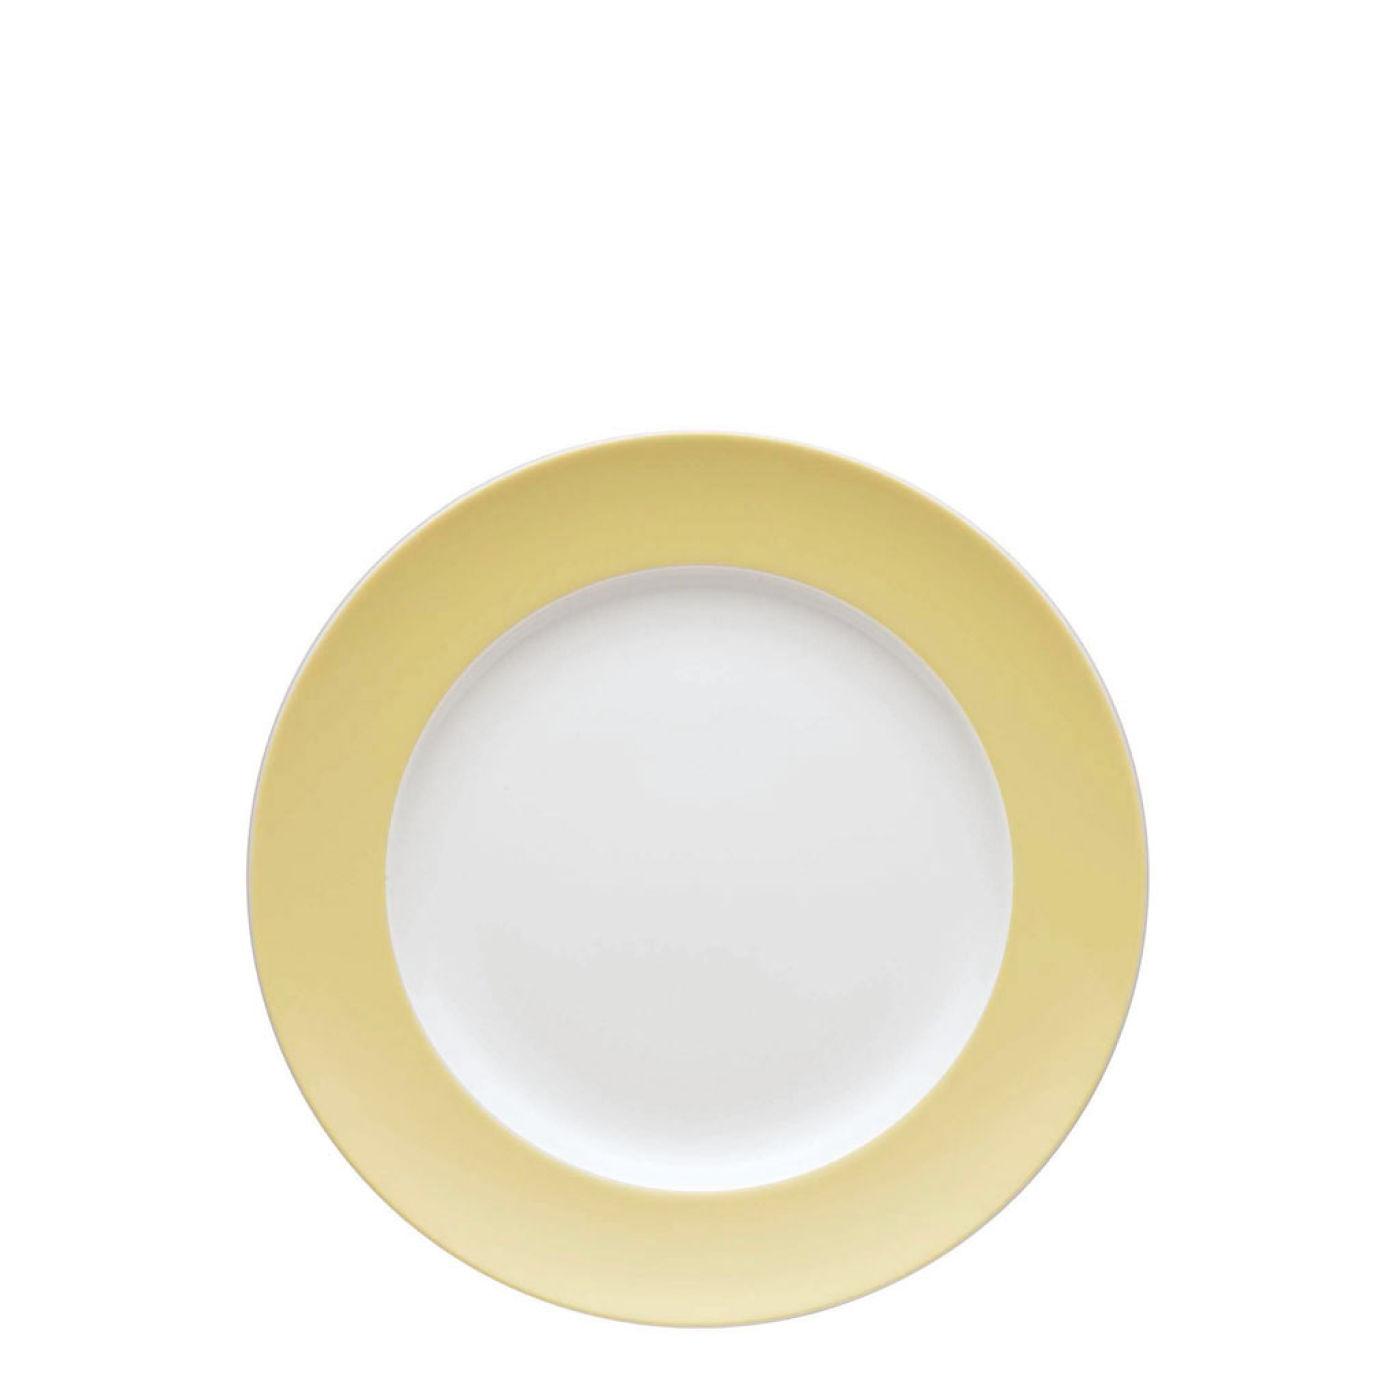 Онлайн каталог PROMENU: Тарелка десертная/закусочная Rosenthal SUNNY DAY, диаметр 22 см, желтый  70850-408511-10222